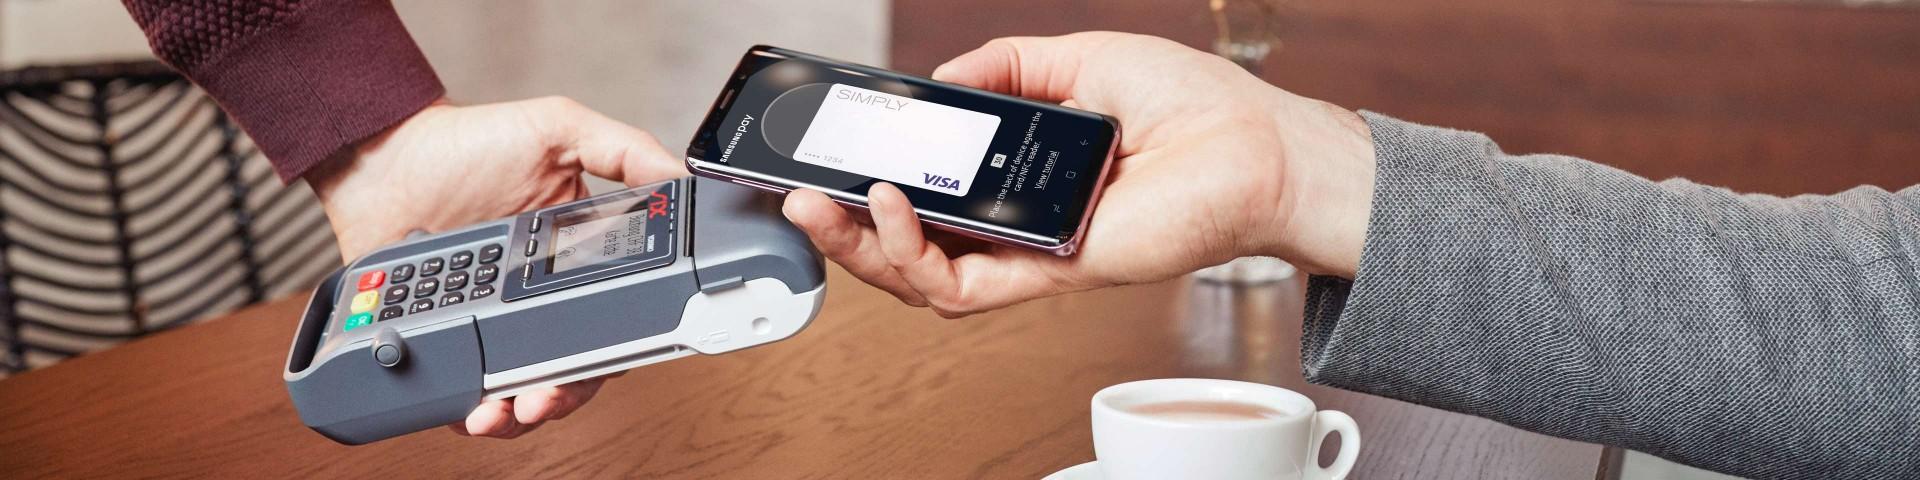 Samsung Pay Zahlsituation